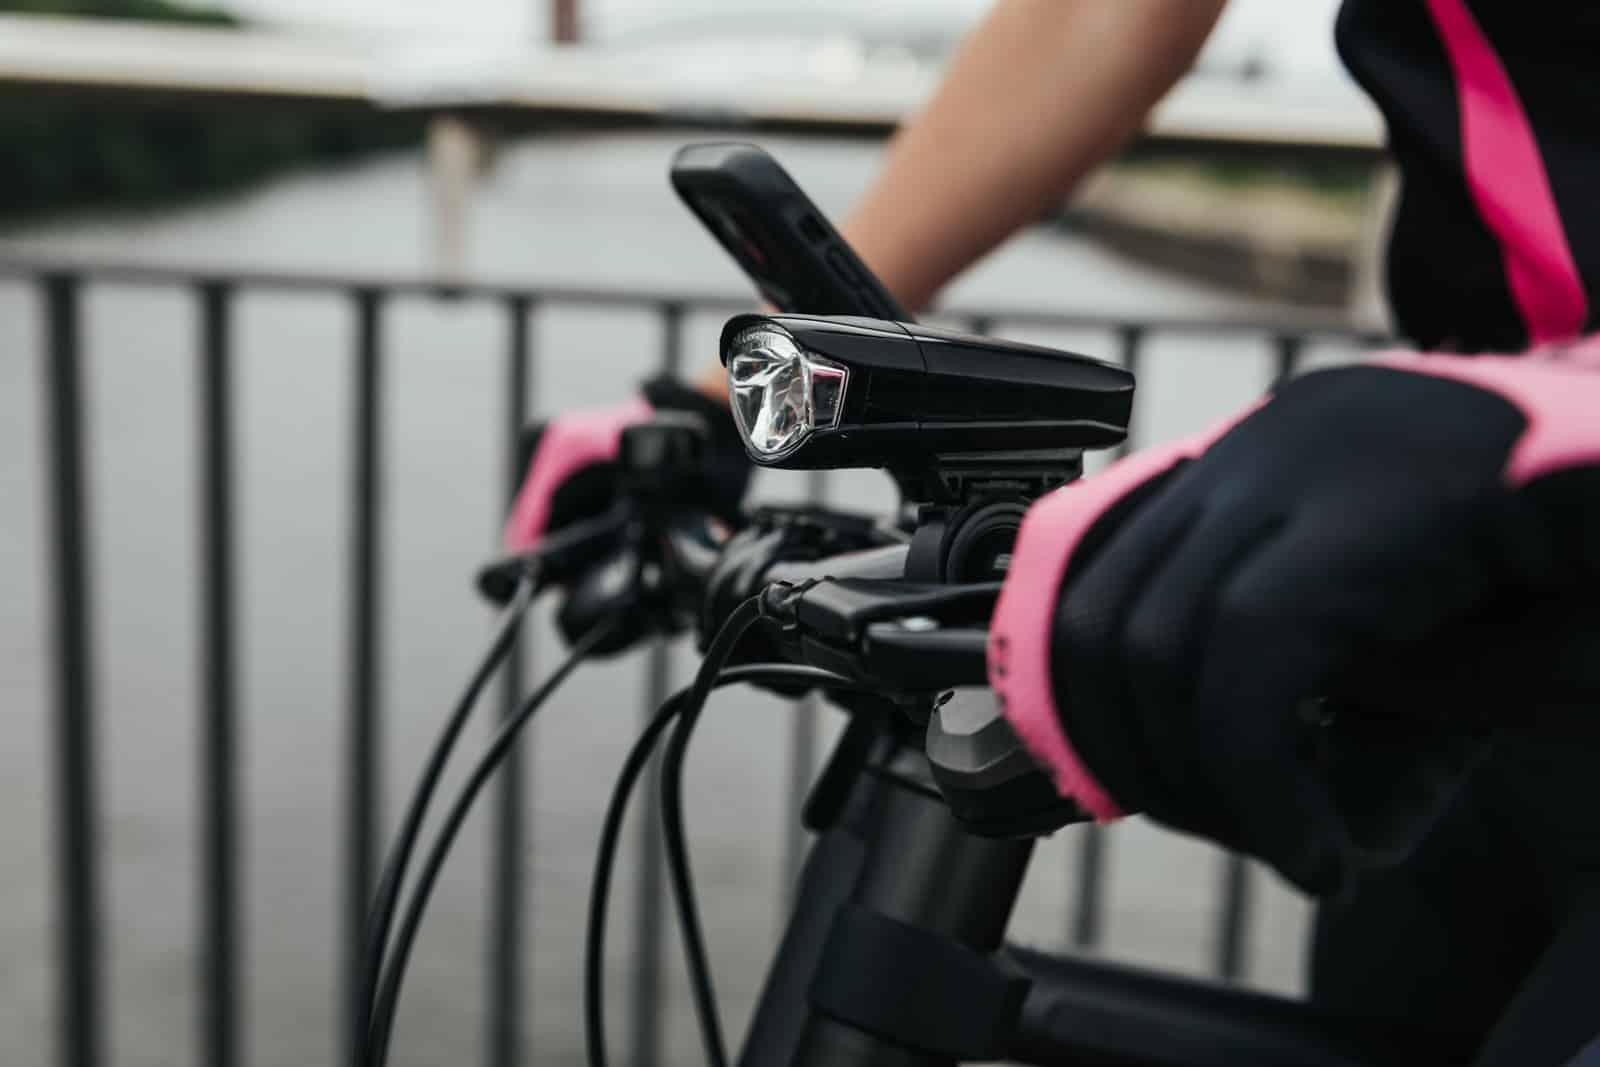 Fahrradlampe auf dem Cannondale Fahrrad